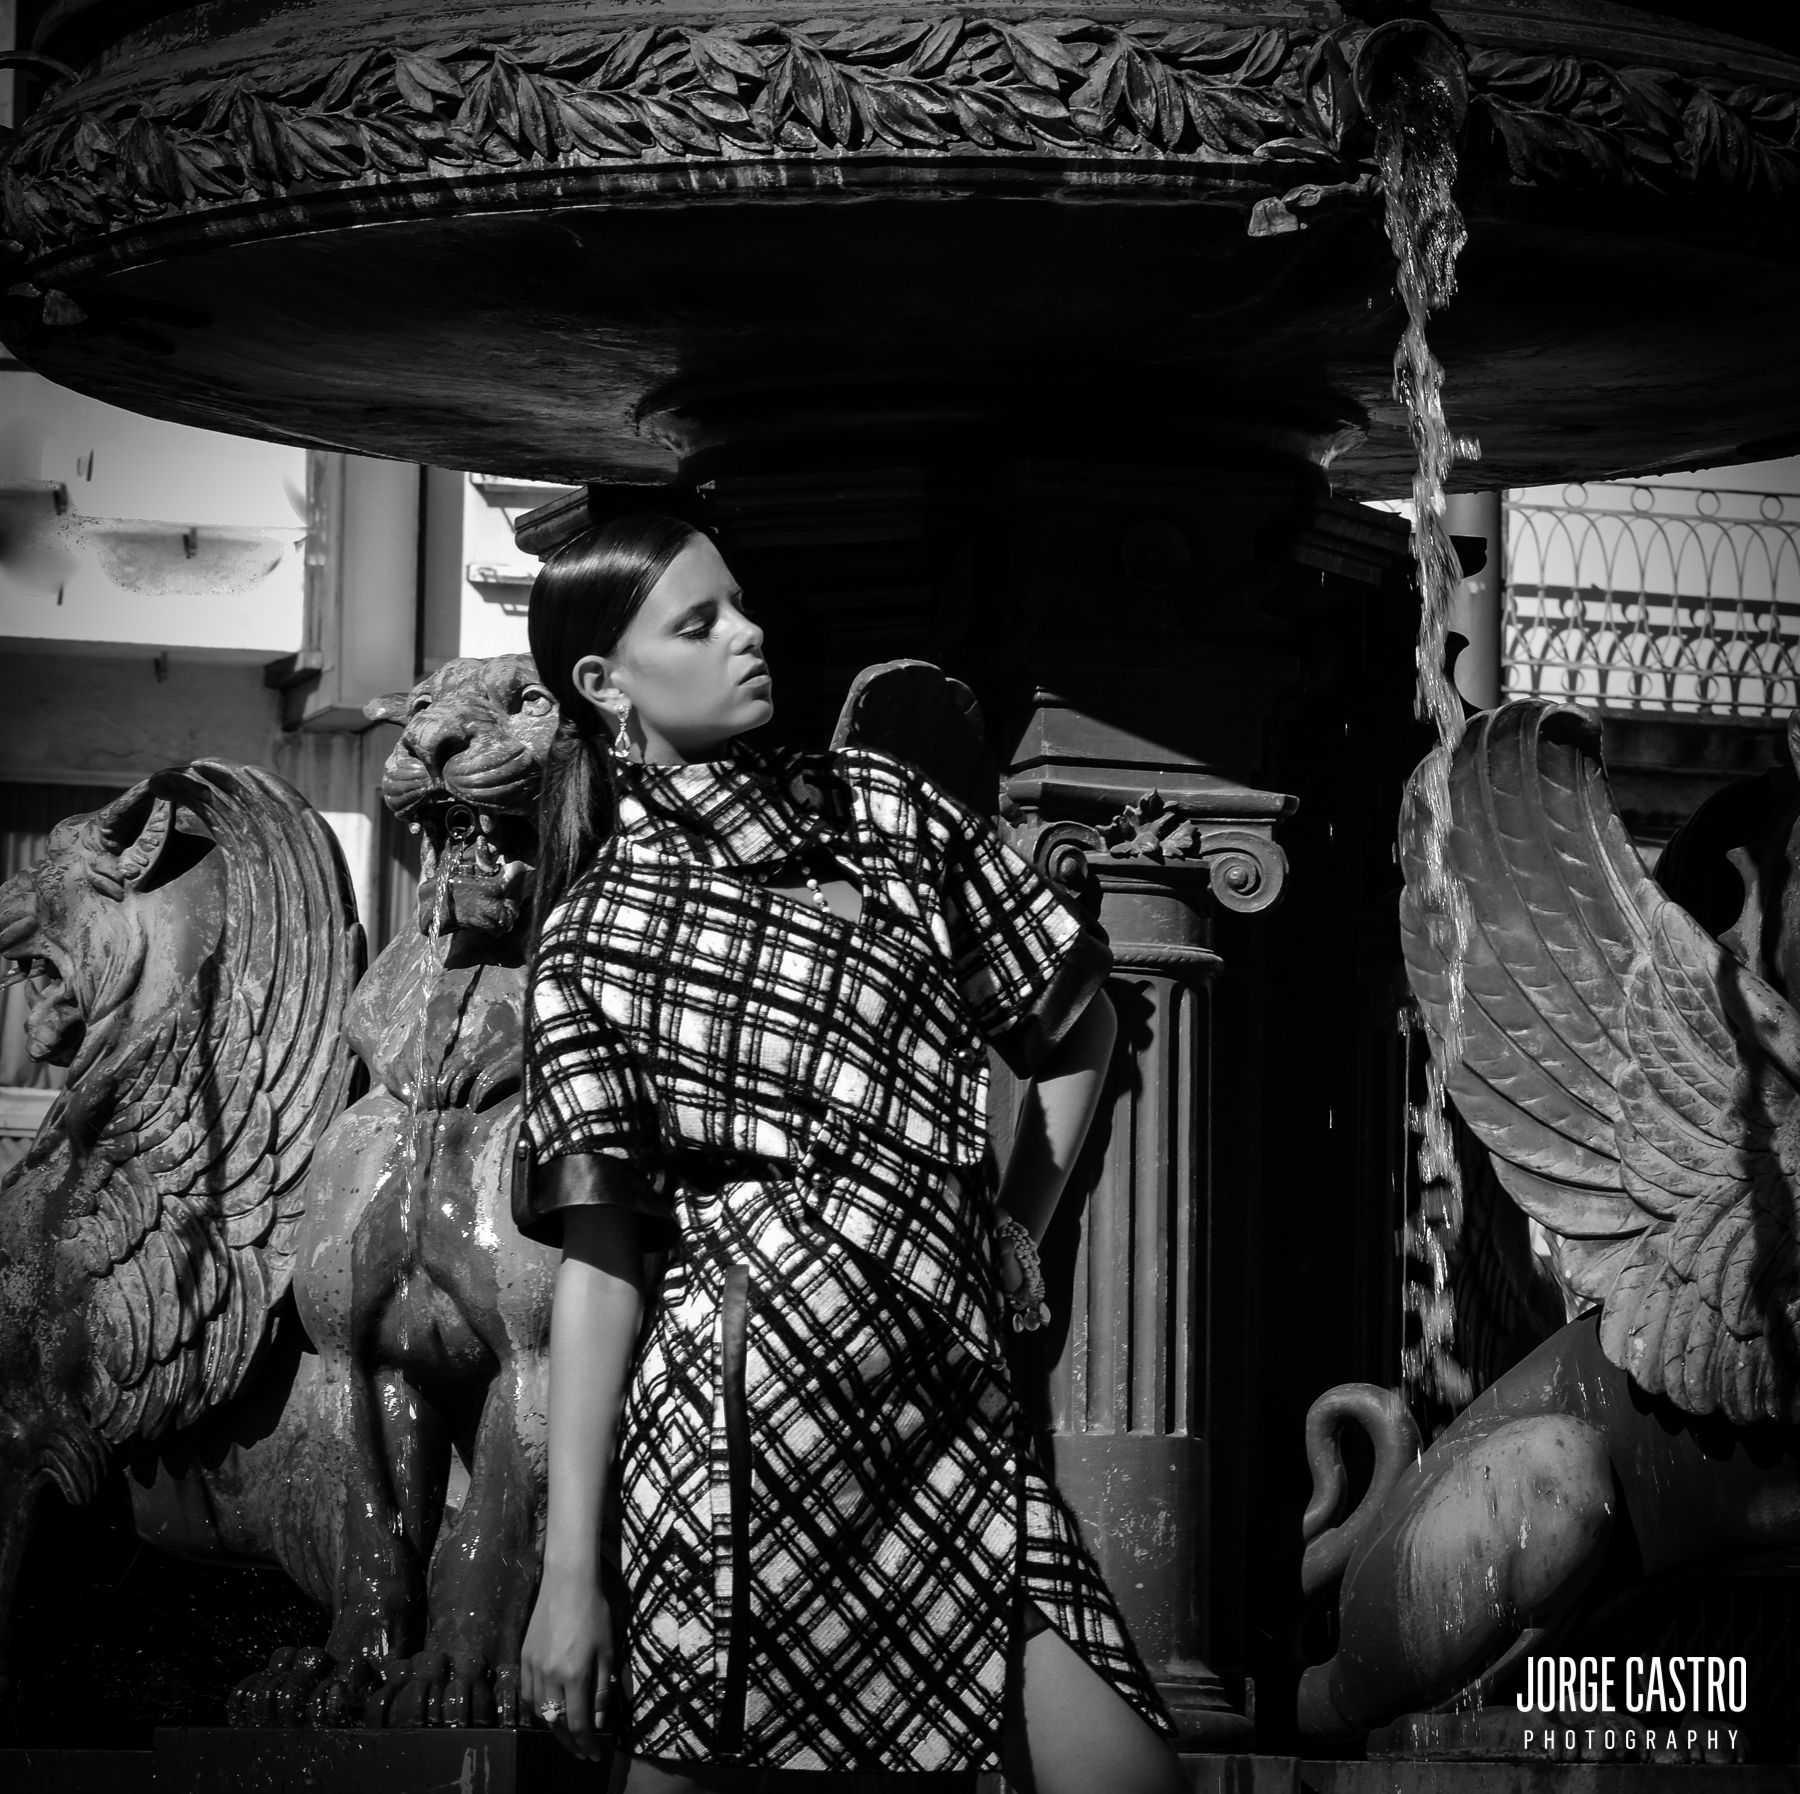 #outonoinverno16 #luisbuchinho #gofrey #photography #porto #portugal #portocruz #fashion #shooting #moda #vinhodoporto #clasico #jóias #Photo #toniguy #hairdres #stiling #maria #karacteragenci  #jorgecastro-photography.com